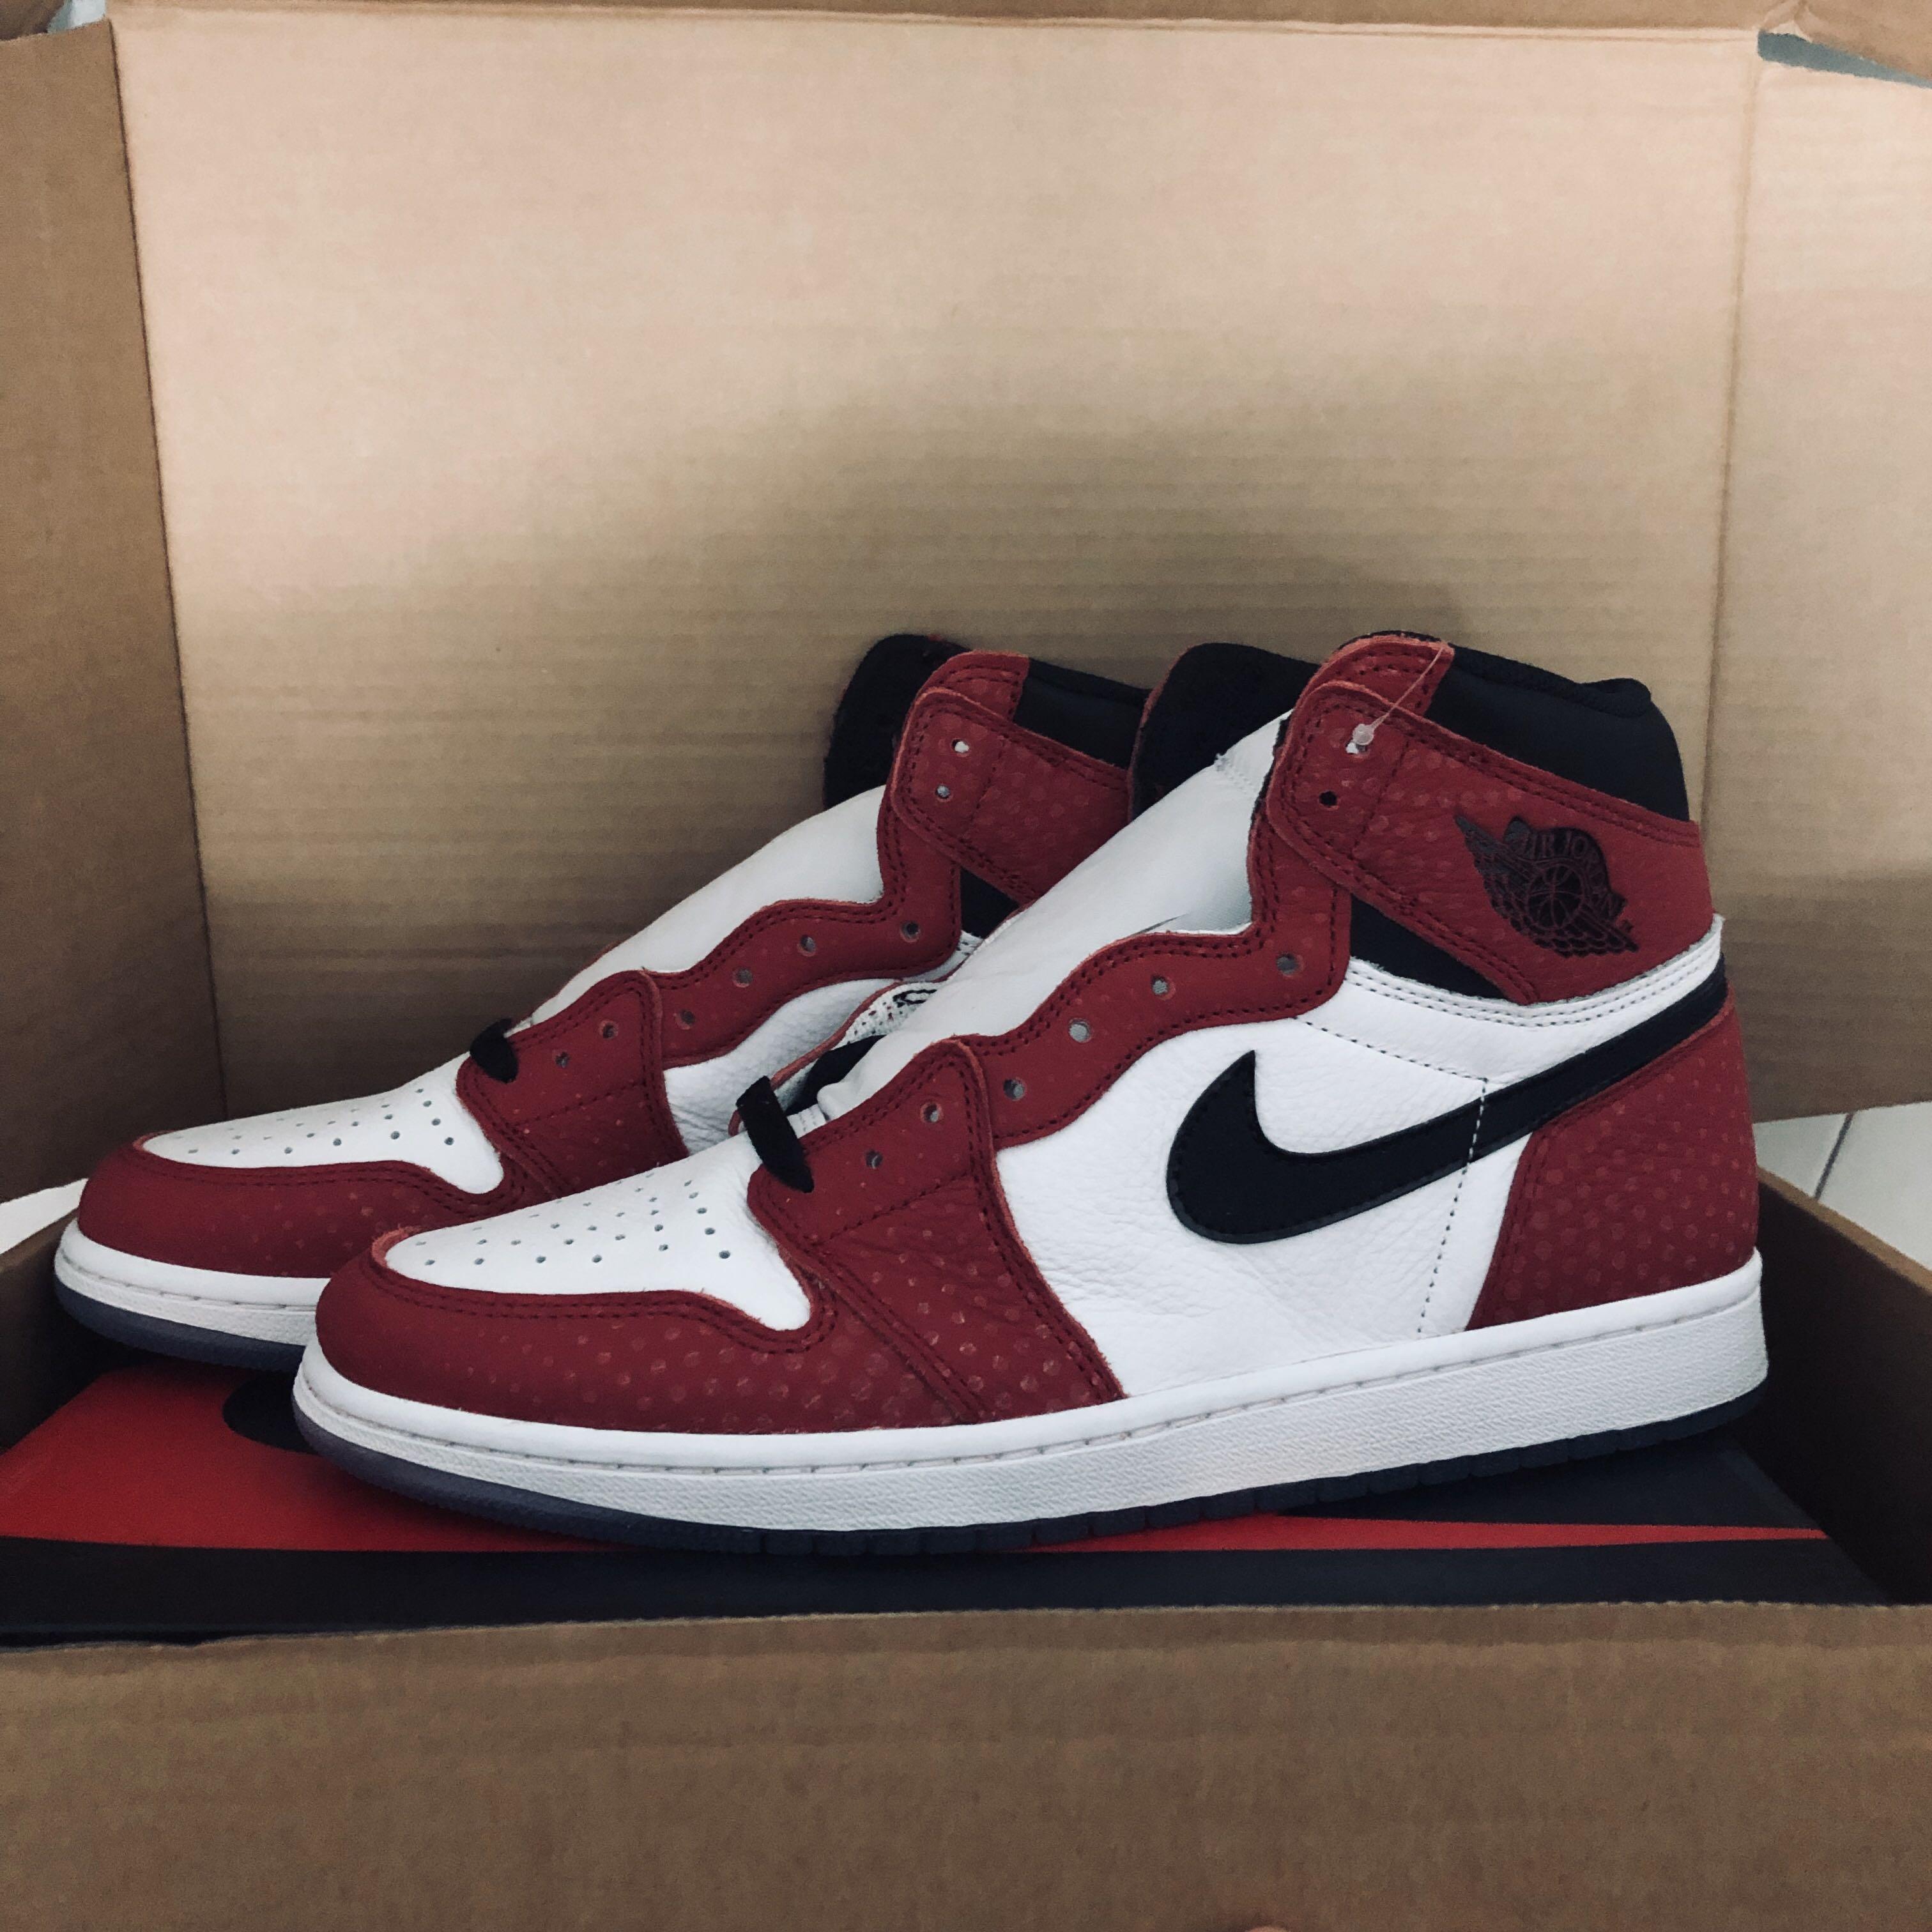 US11) Nike Air Jordan 1 Retro High Og